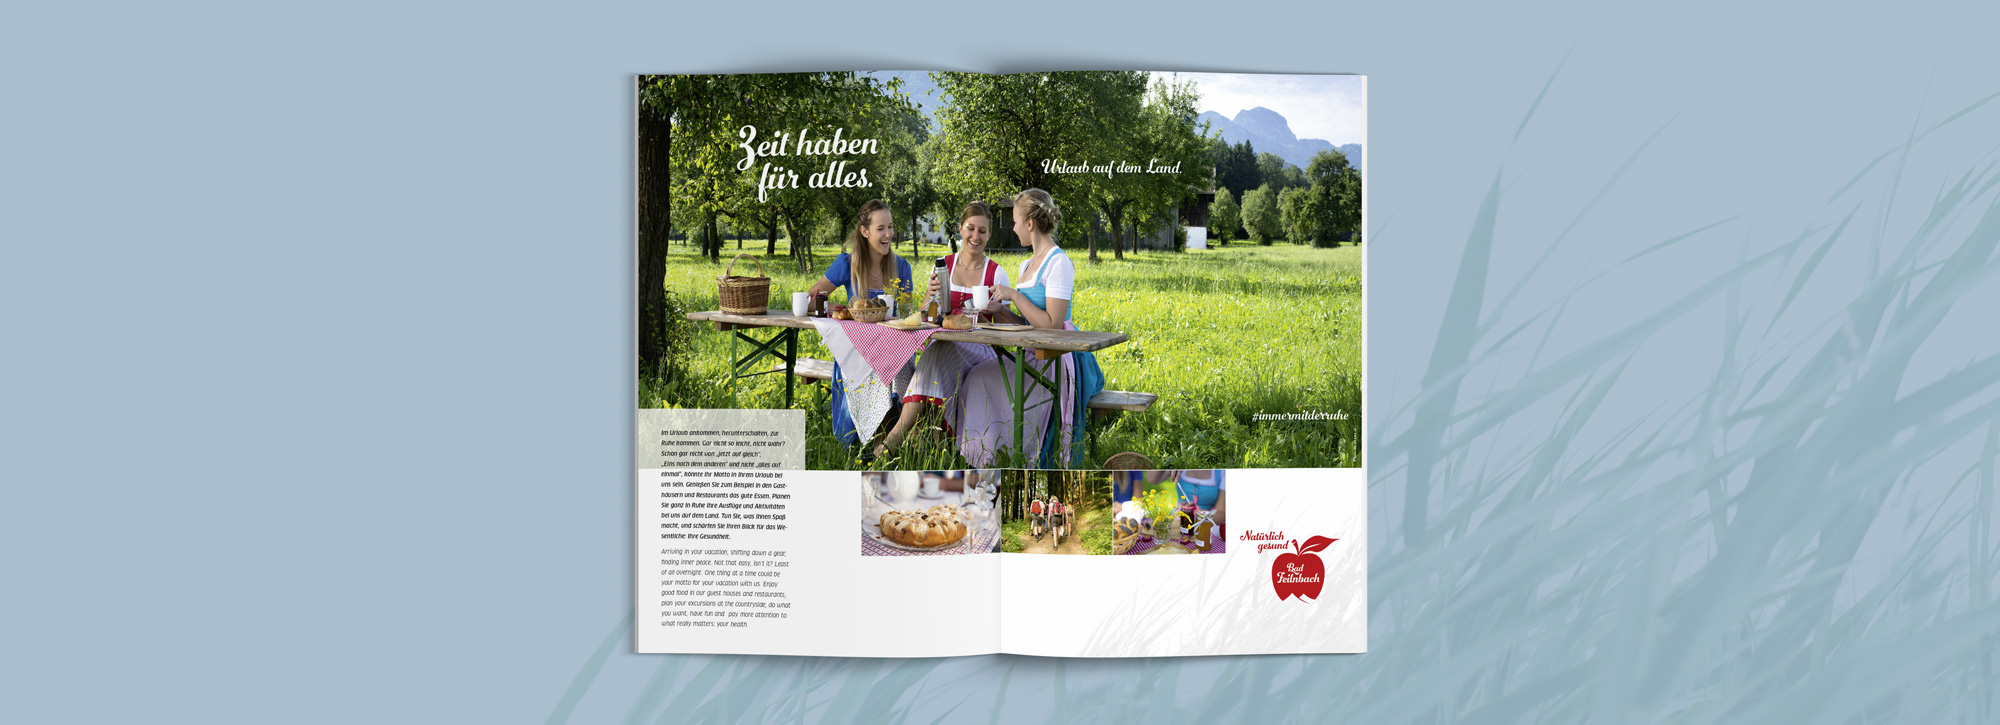 werbung-fuer-tourismus-bad-feilnbach